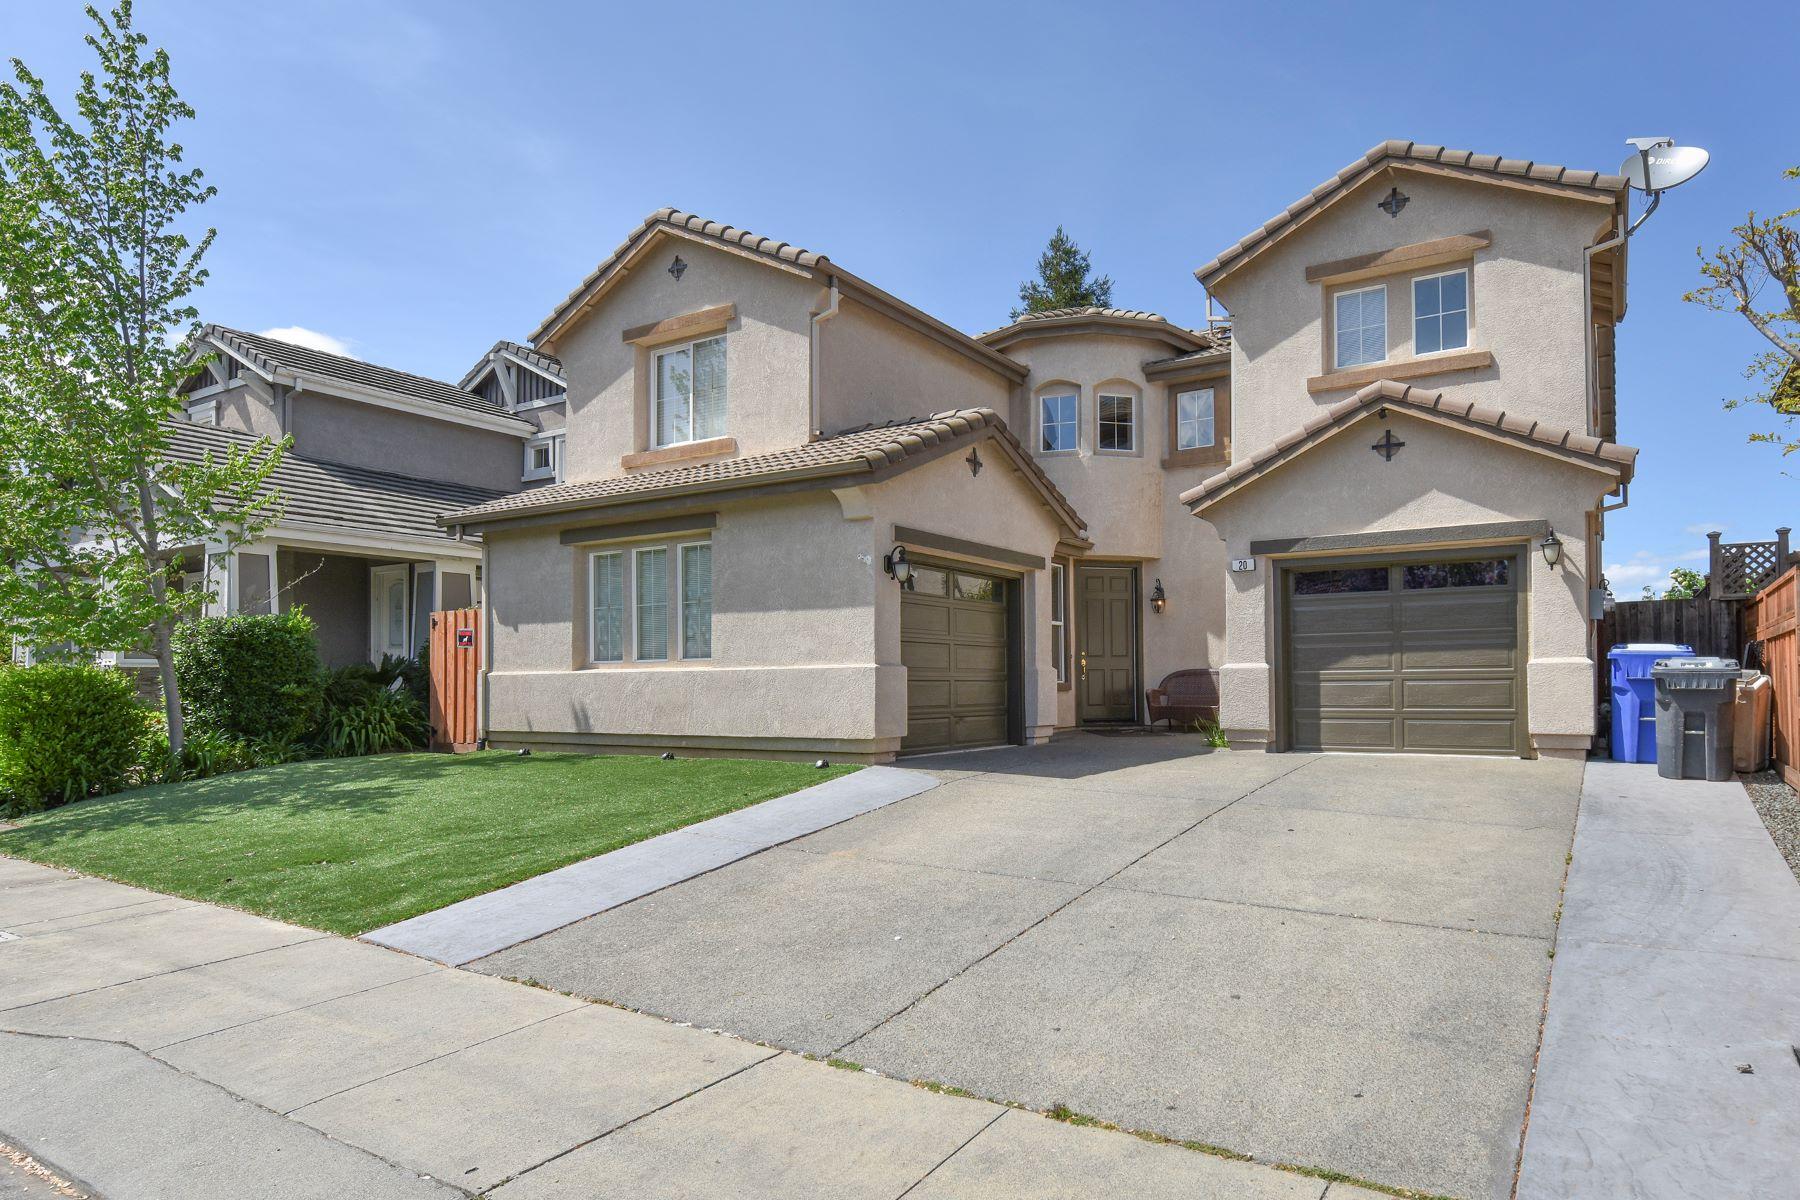 Casa Unifamiliar por un Venta en A Spacious and Elegant Home with an Open Floor Plan 20 Blackberry Drive Napa, California, 94558 Estados Unidos